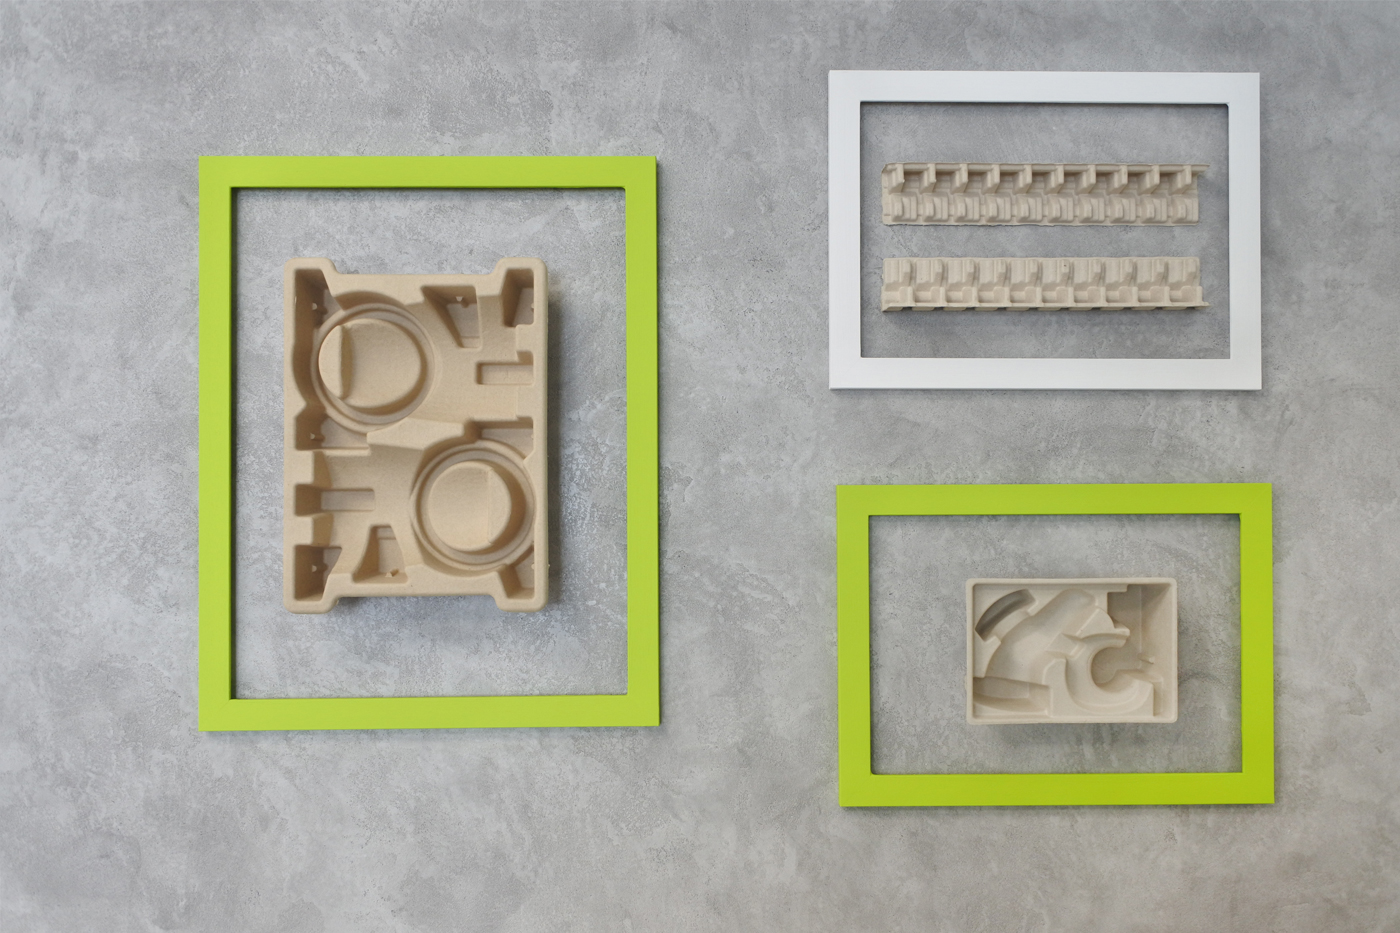 Design interiérů firmy Tridas